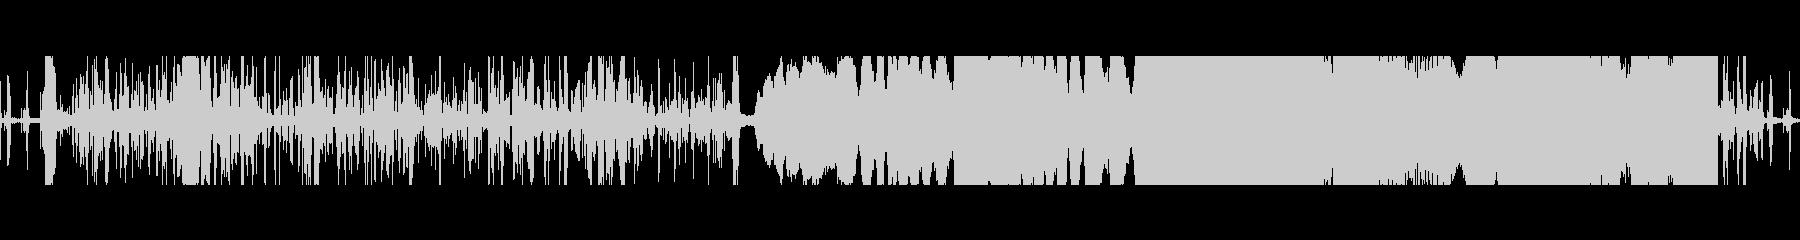 FMラジオの検索の未再生の波形